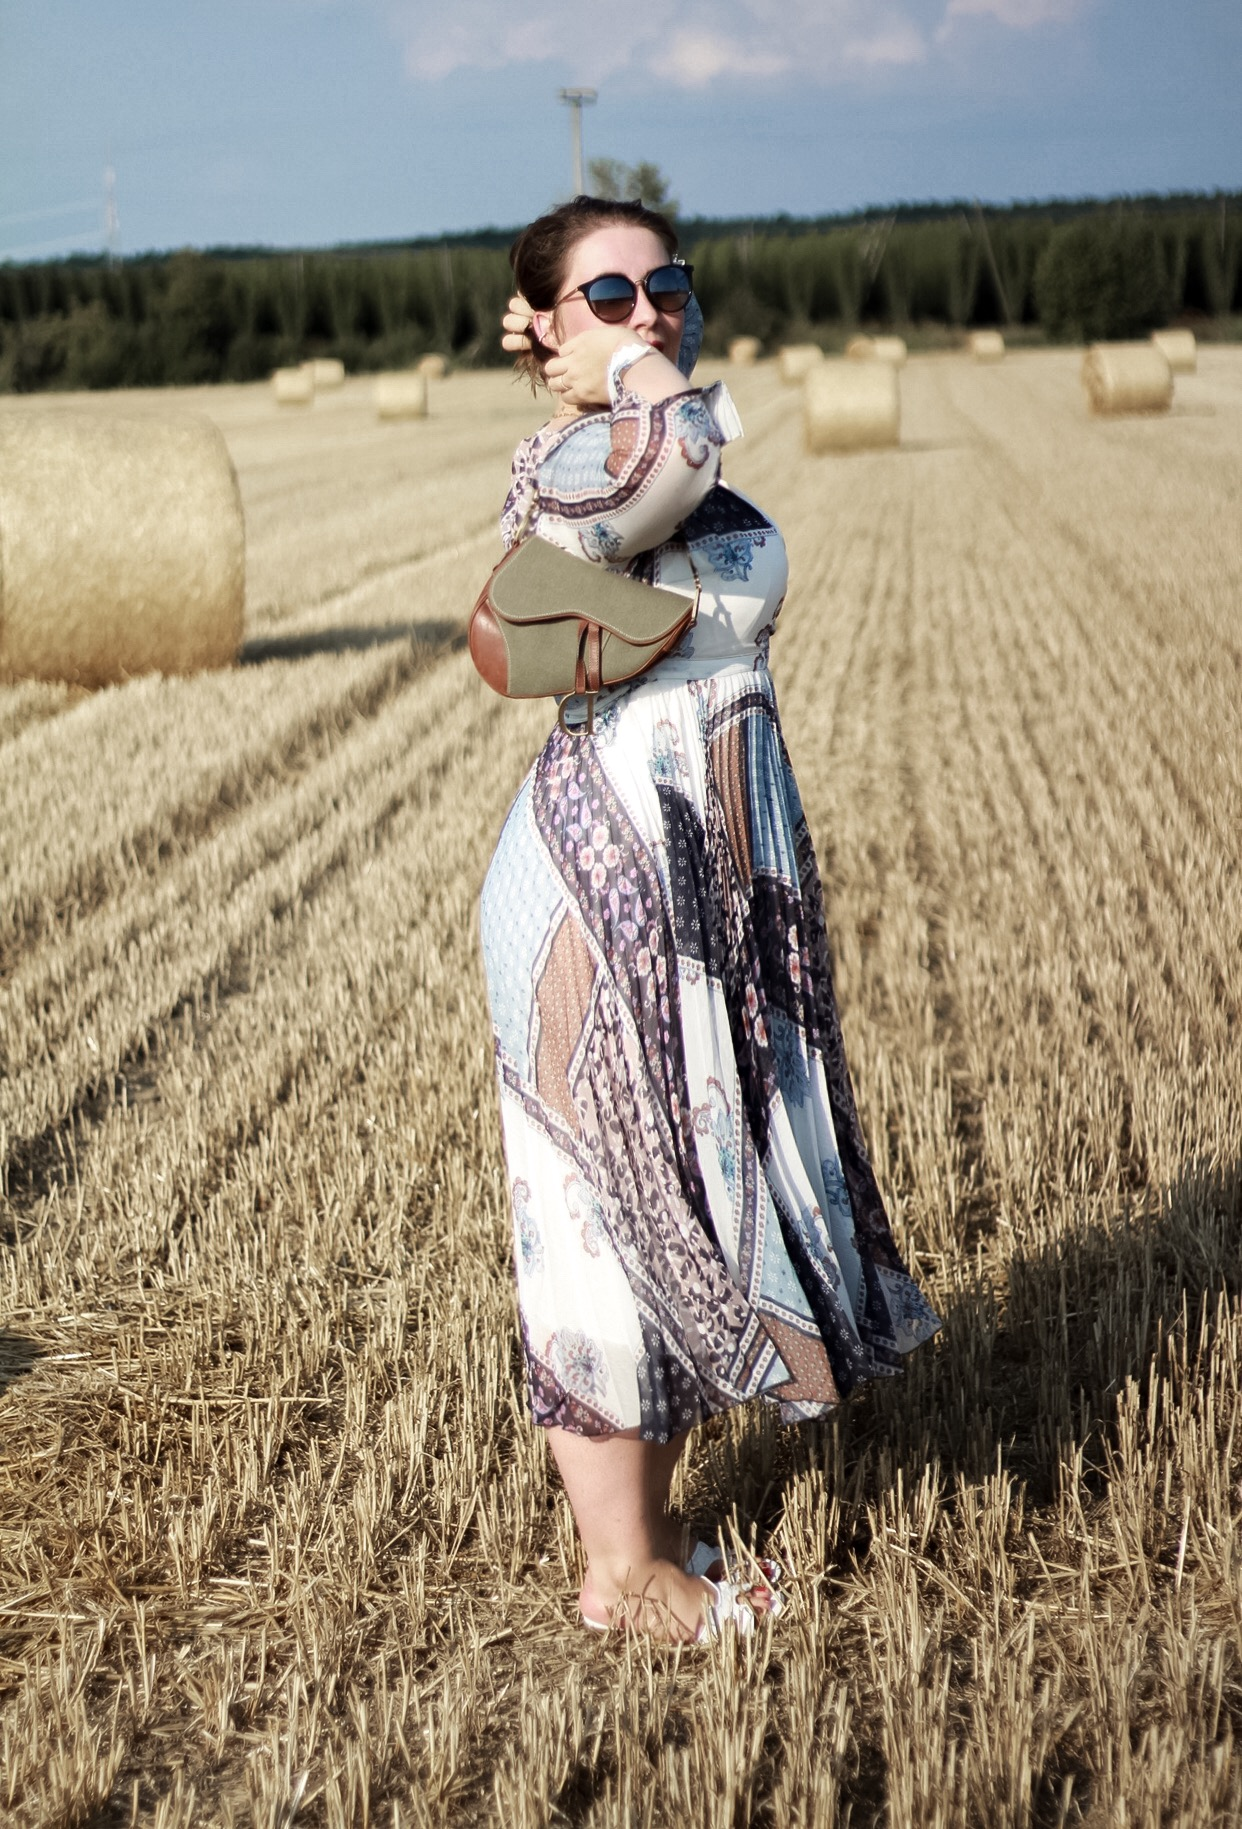 Boho-Vibes-Hippie-Kleid-Miss-Suzie-Loves-Susanne-Heidebach-Feminines-Patchwork-Kleid-H&M-Wickelkleid-Fotoshooting-Weizenfeld-Vintage-Dior-Saddle-Bag